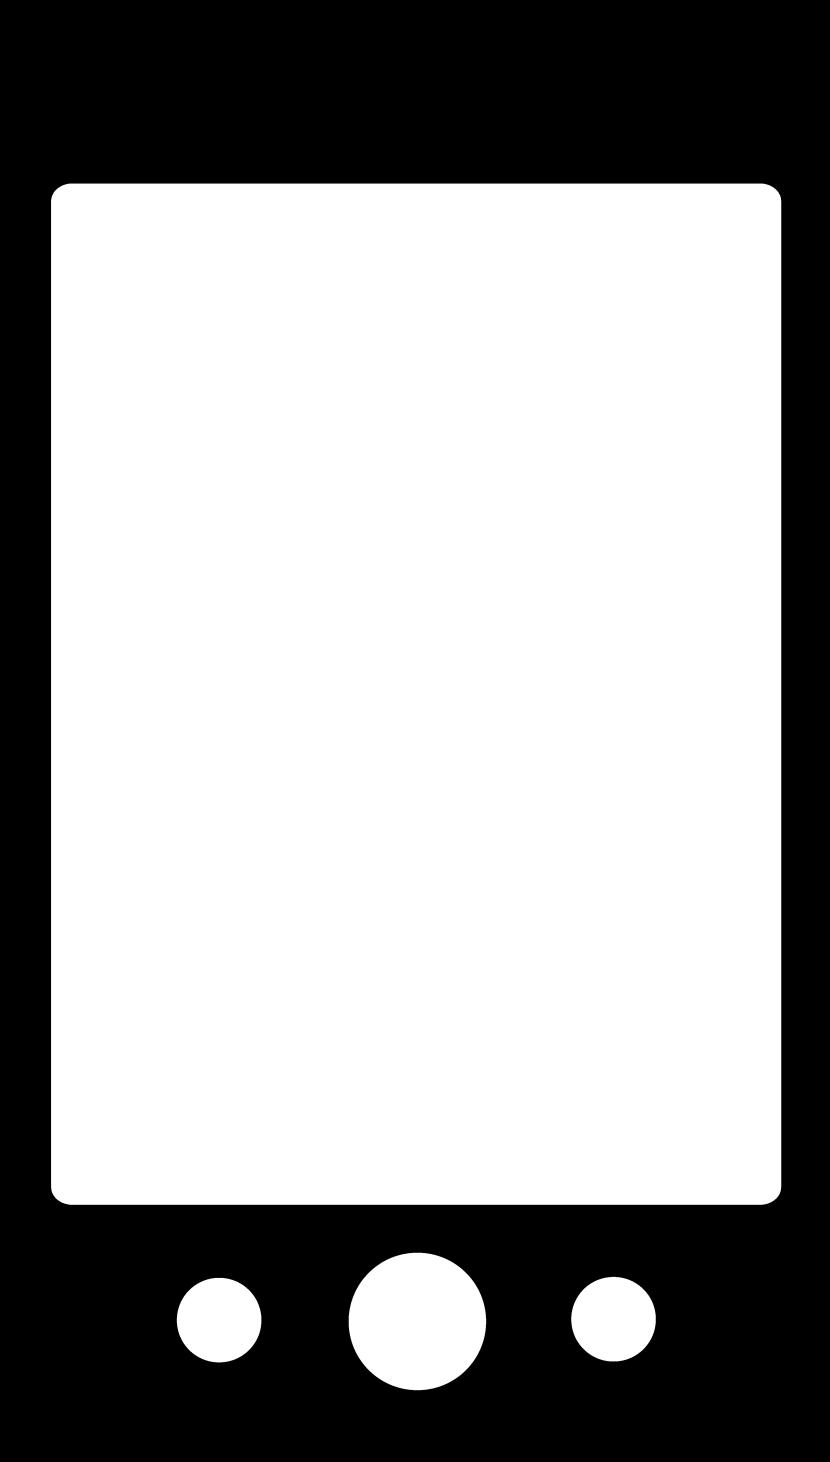 Phone Clipart Clipart Cliparts .-Phone clipart clipart cliparts .-17